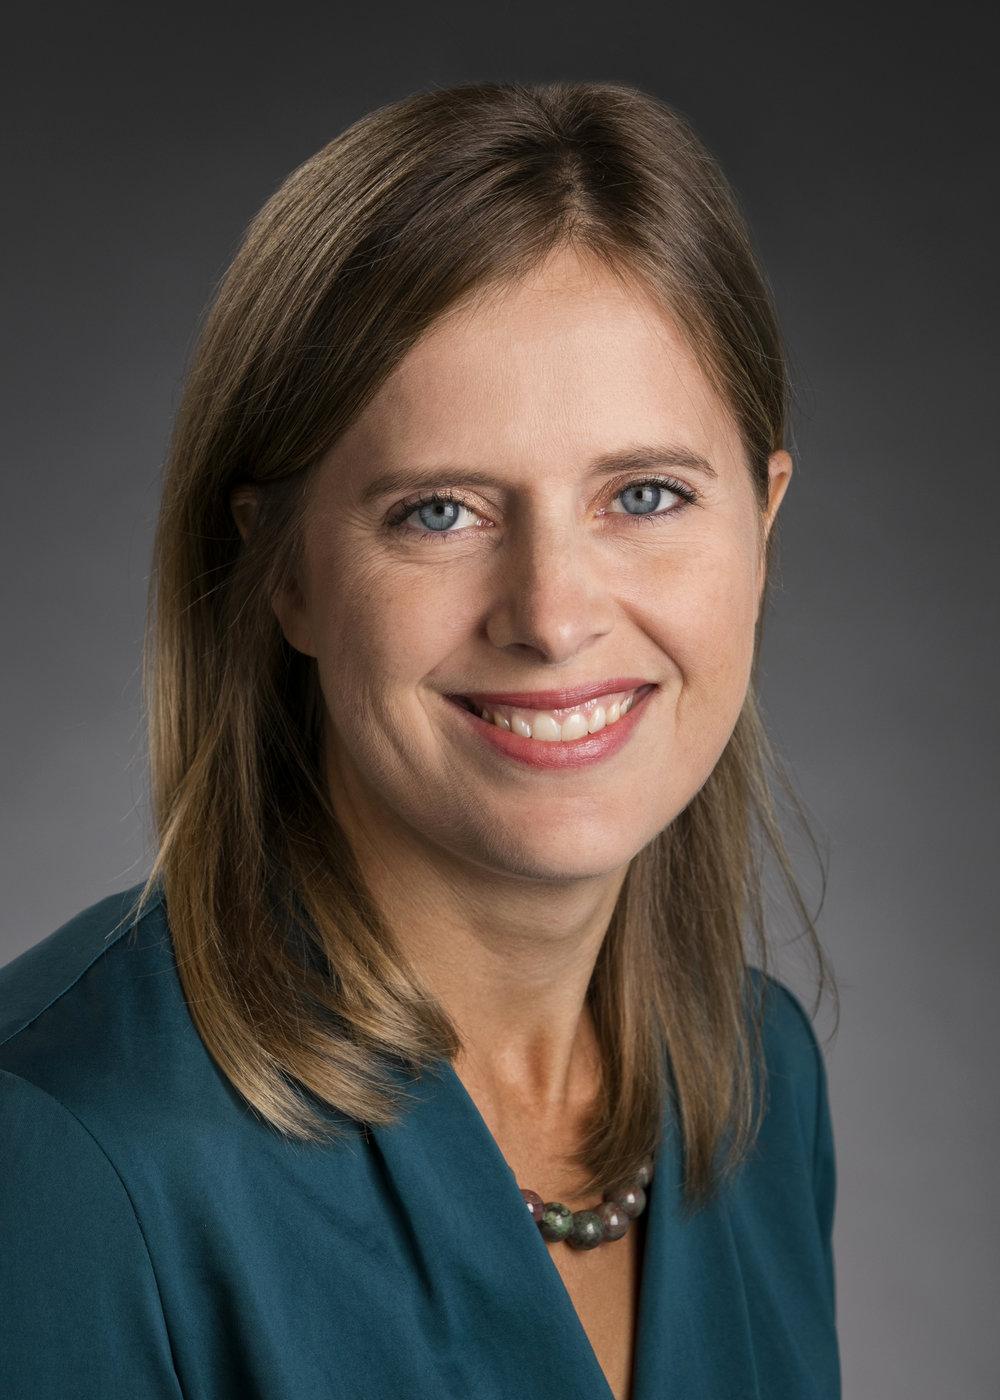 Becky Hultberg  President/CEO of the Alaska State Hospital and Nursing Home Association